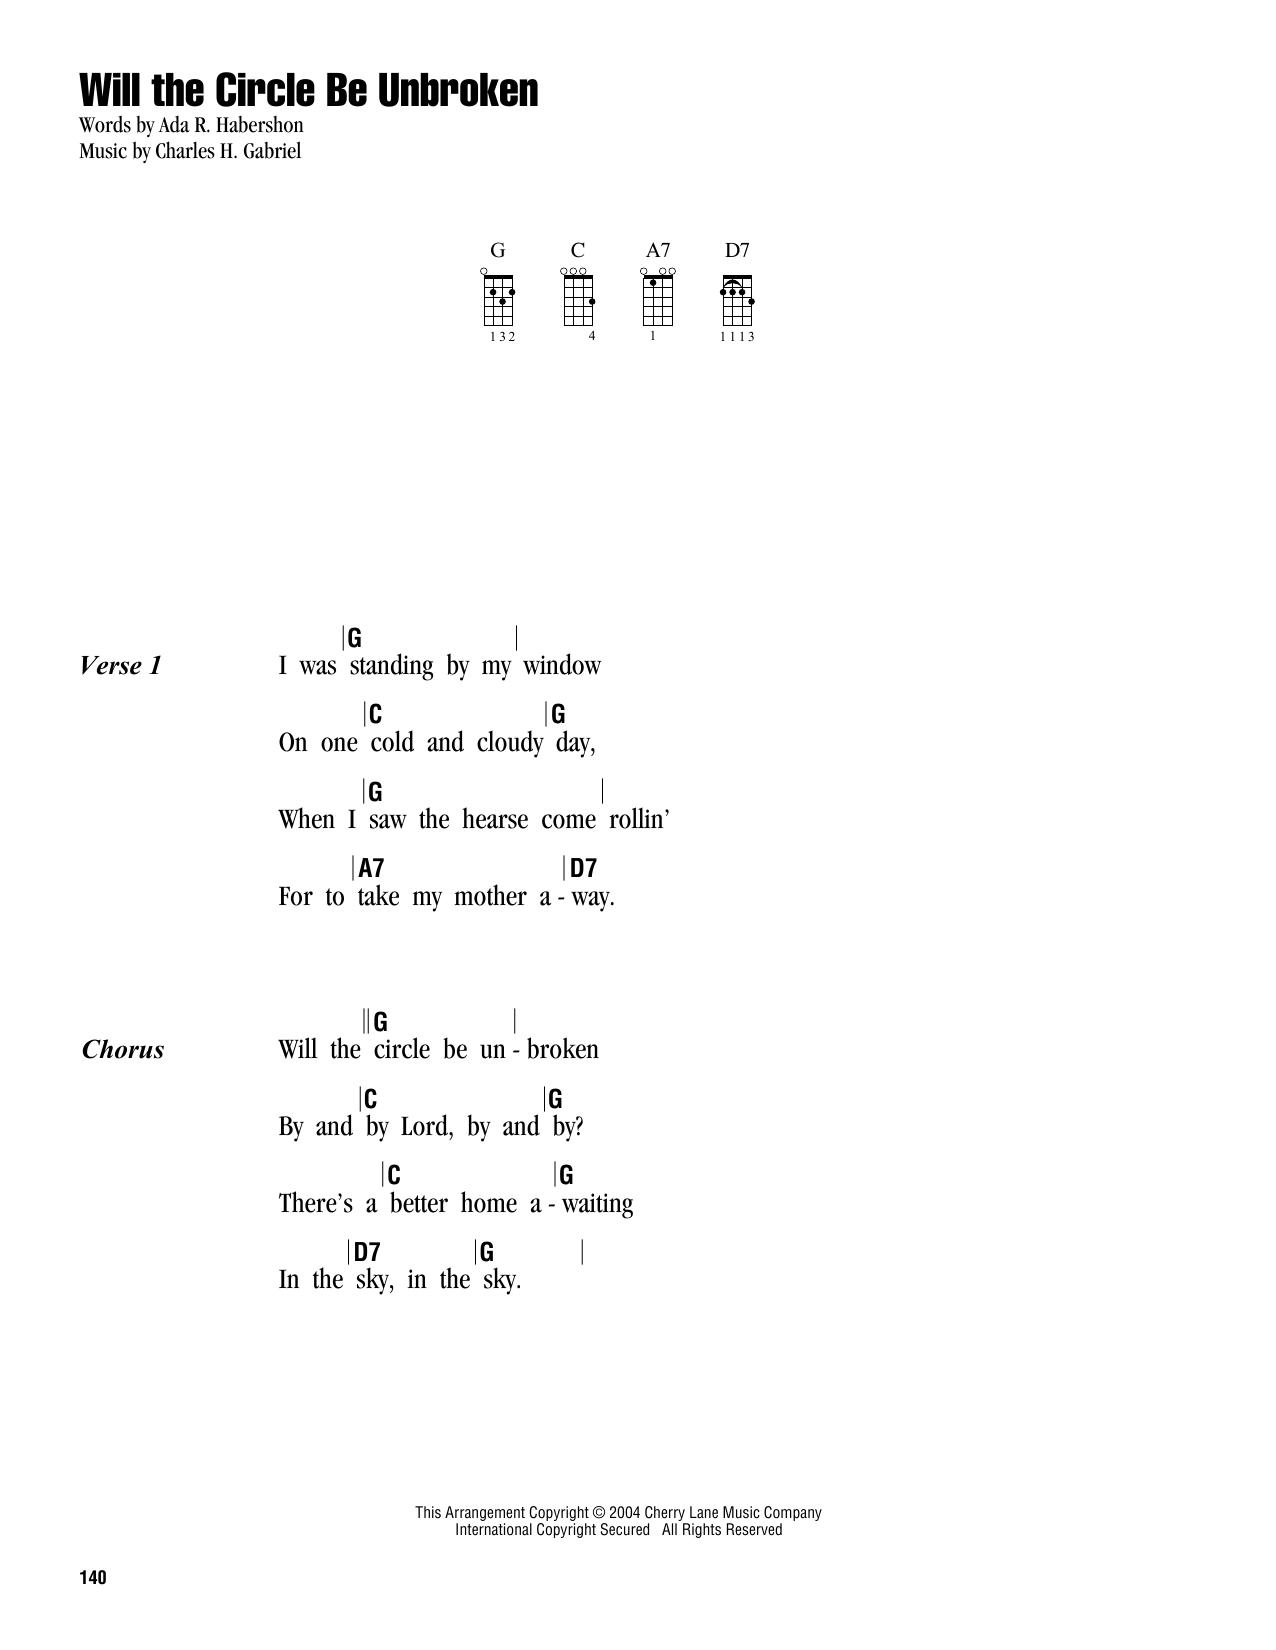 Tablature guitare Will The Circle Be Unbroken de Charles H. Gabriel - Ukulele (strumming patterns)